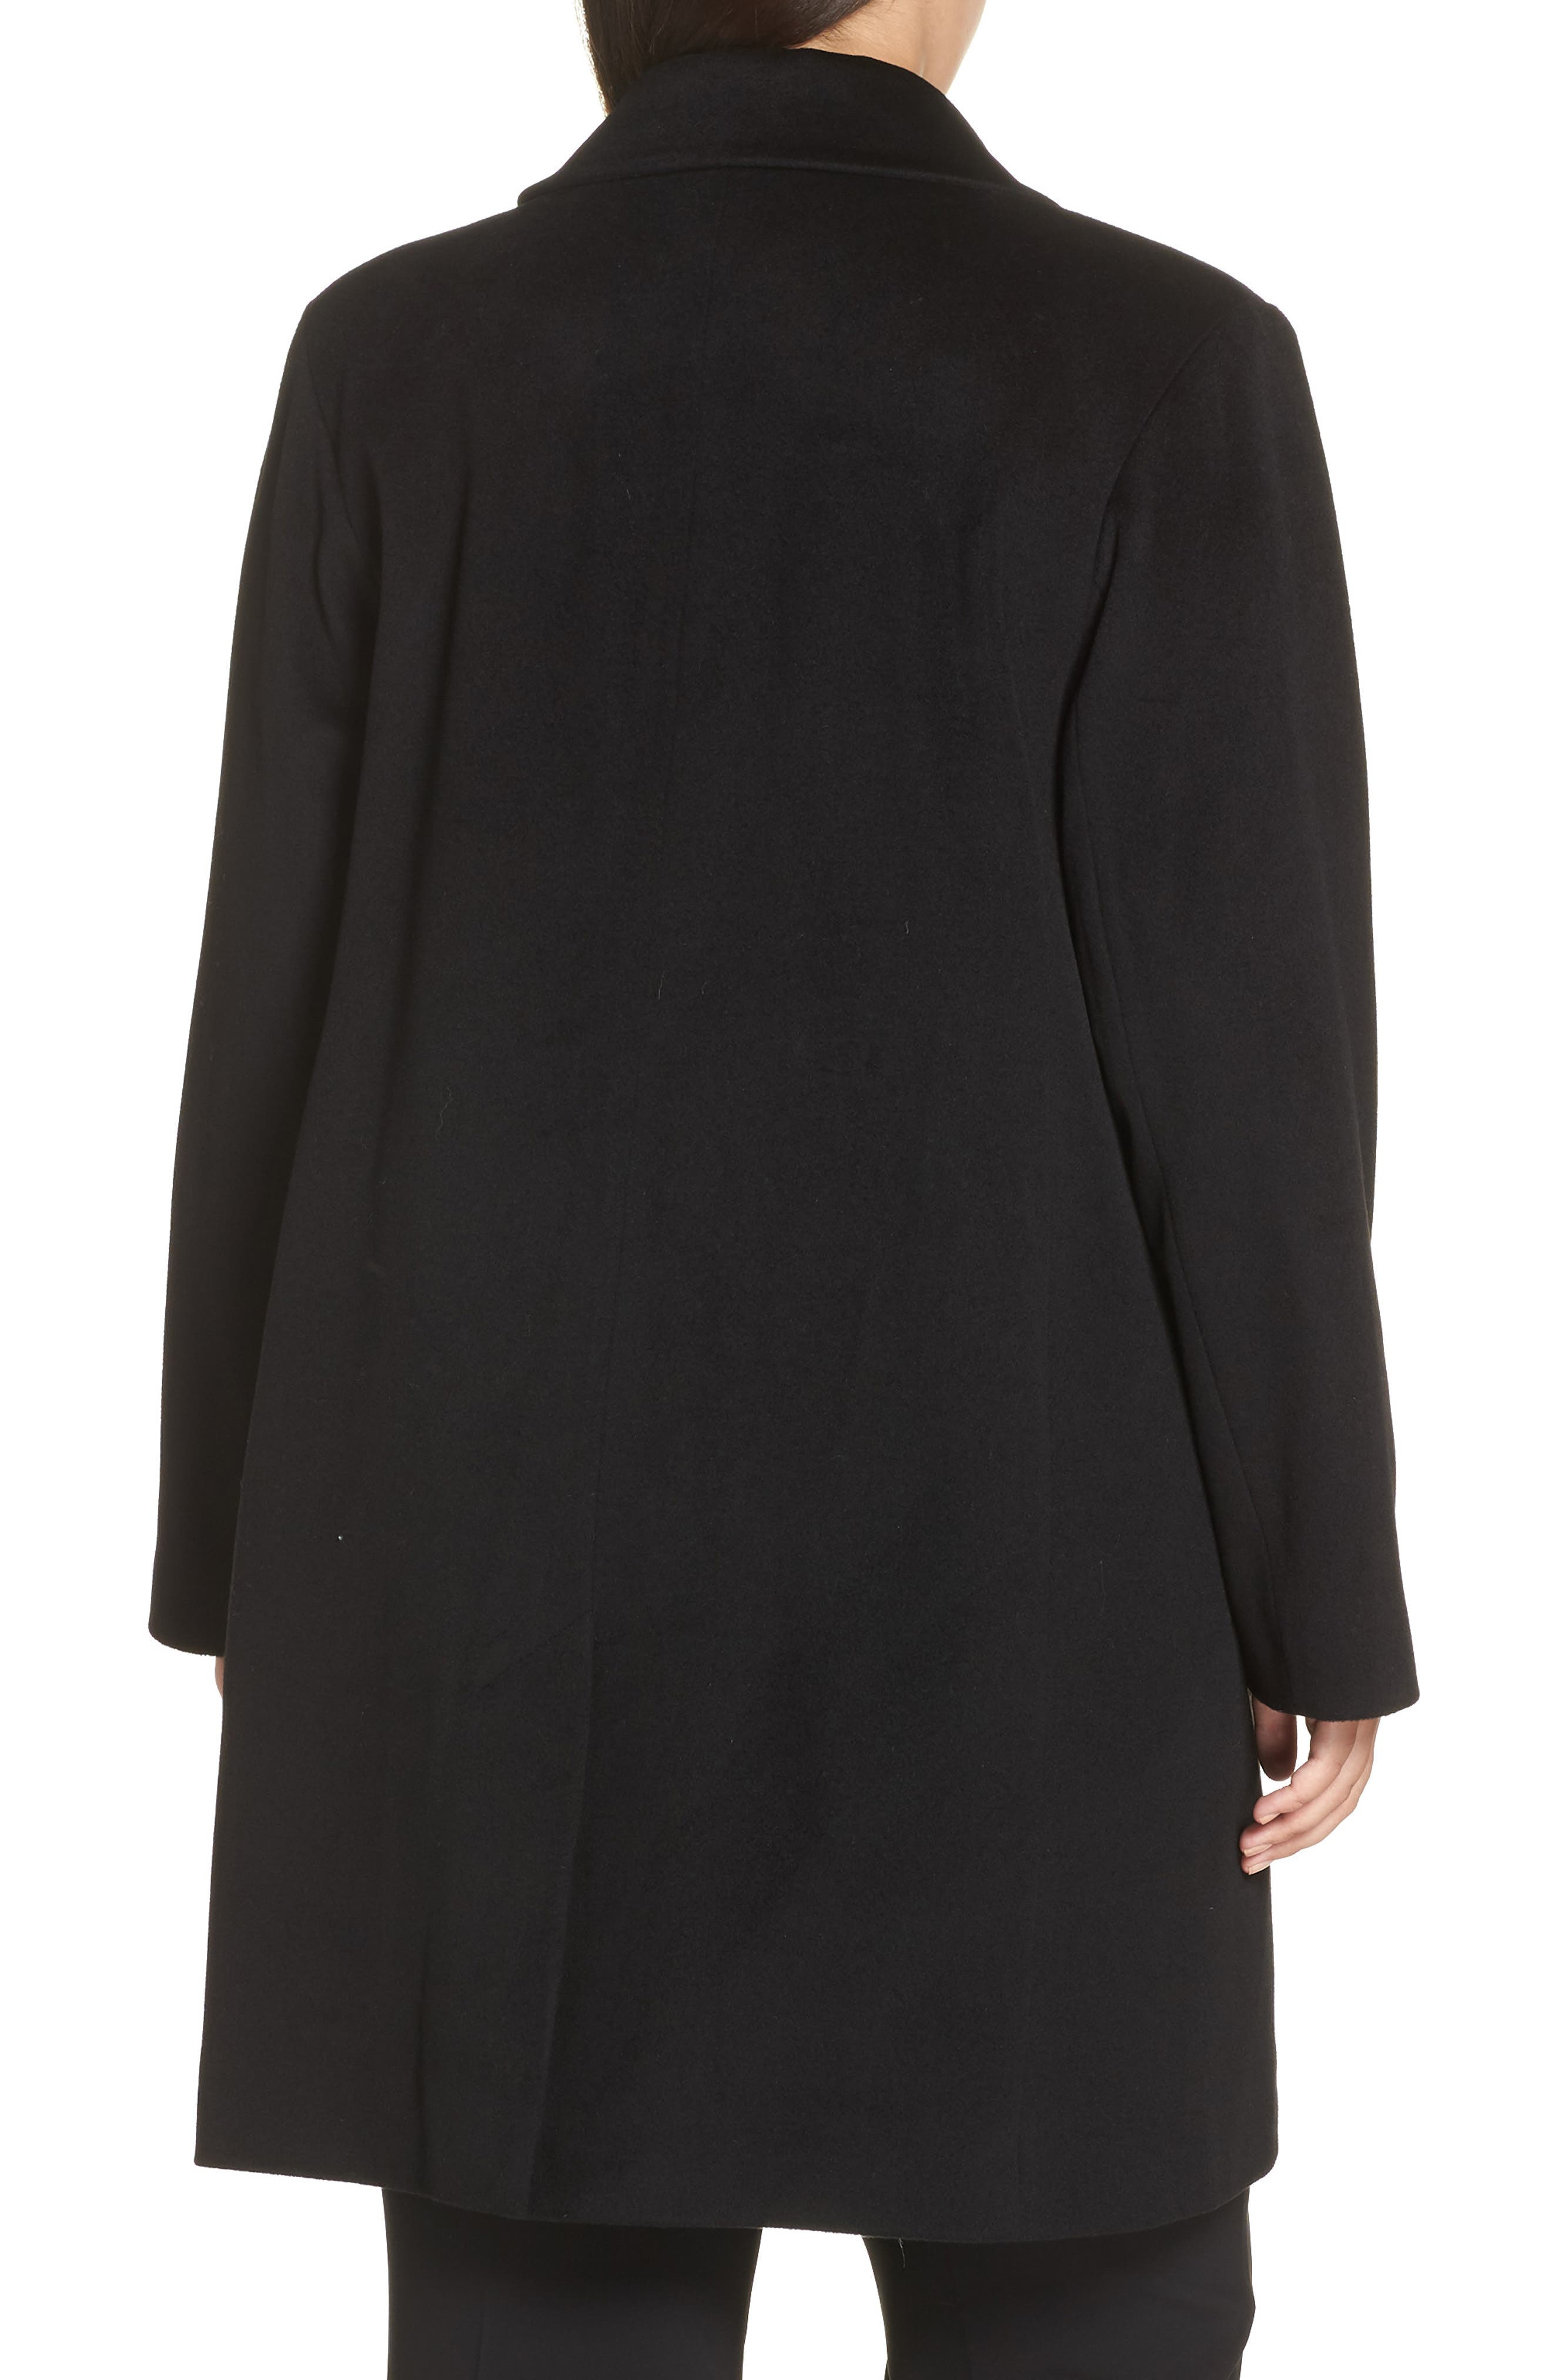 FLEURETTE, Notch Collar Loro Piana Wool Coat, Alternate thumbnail 2, color, BLACK